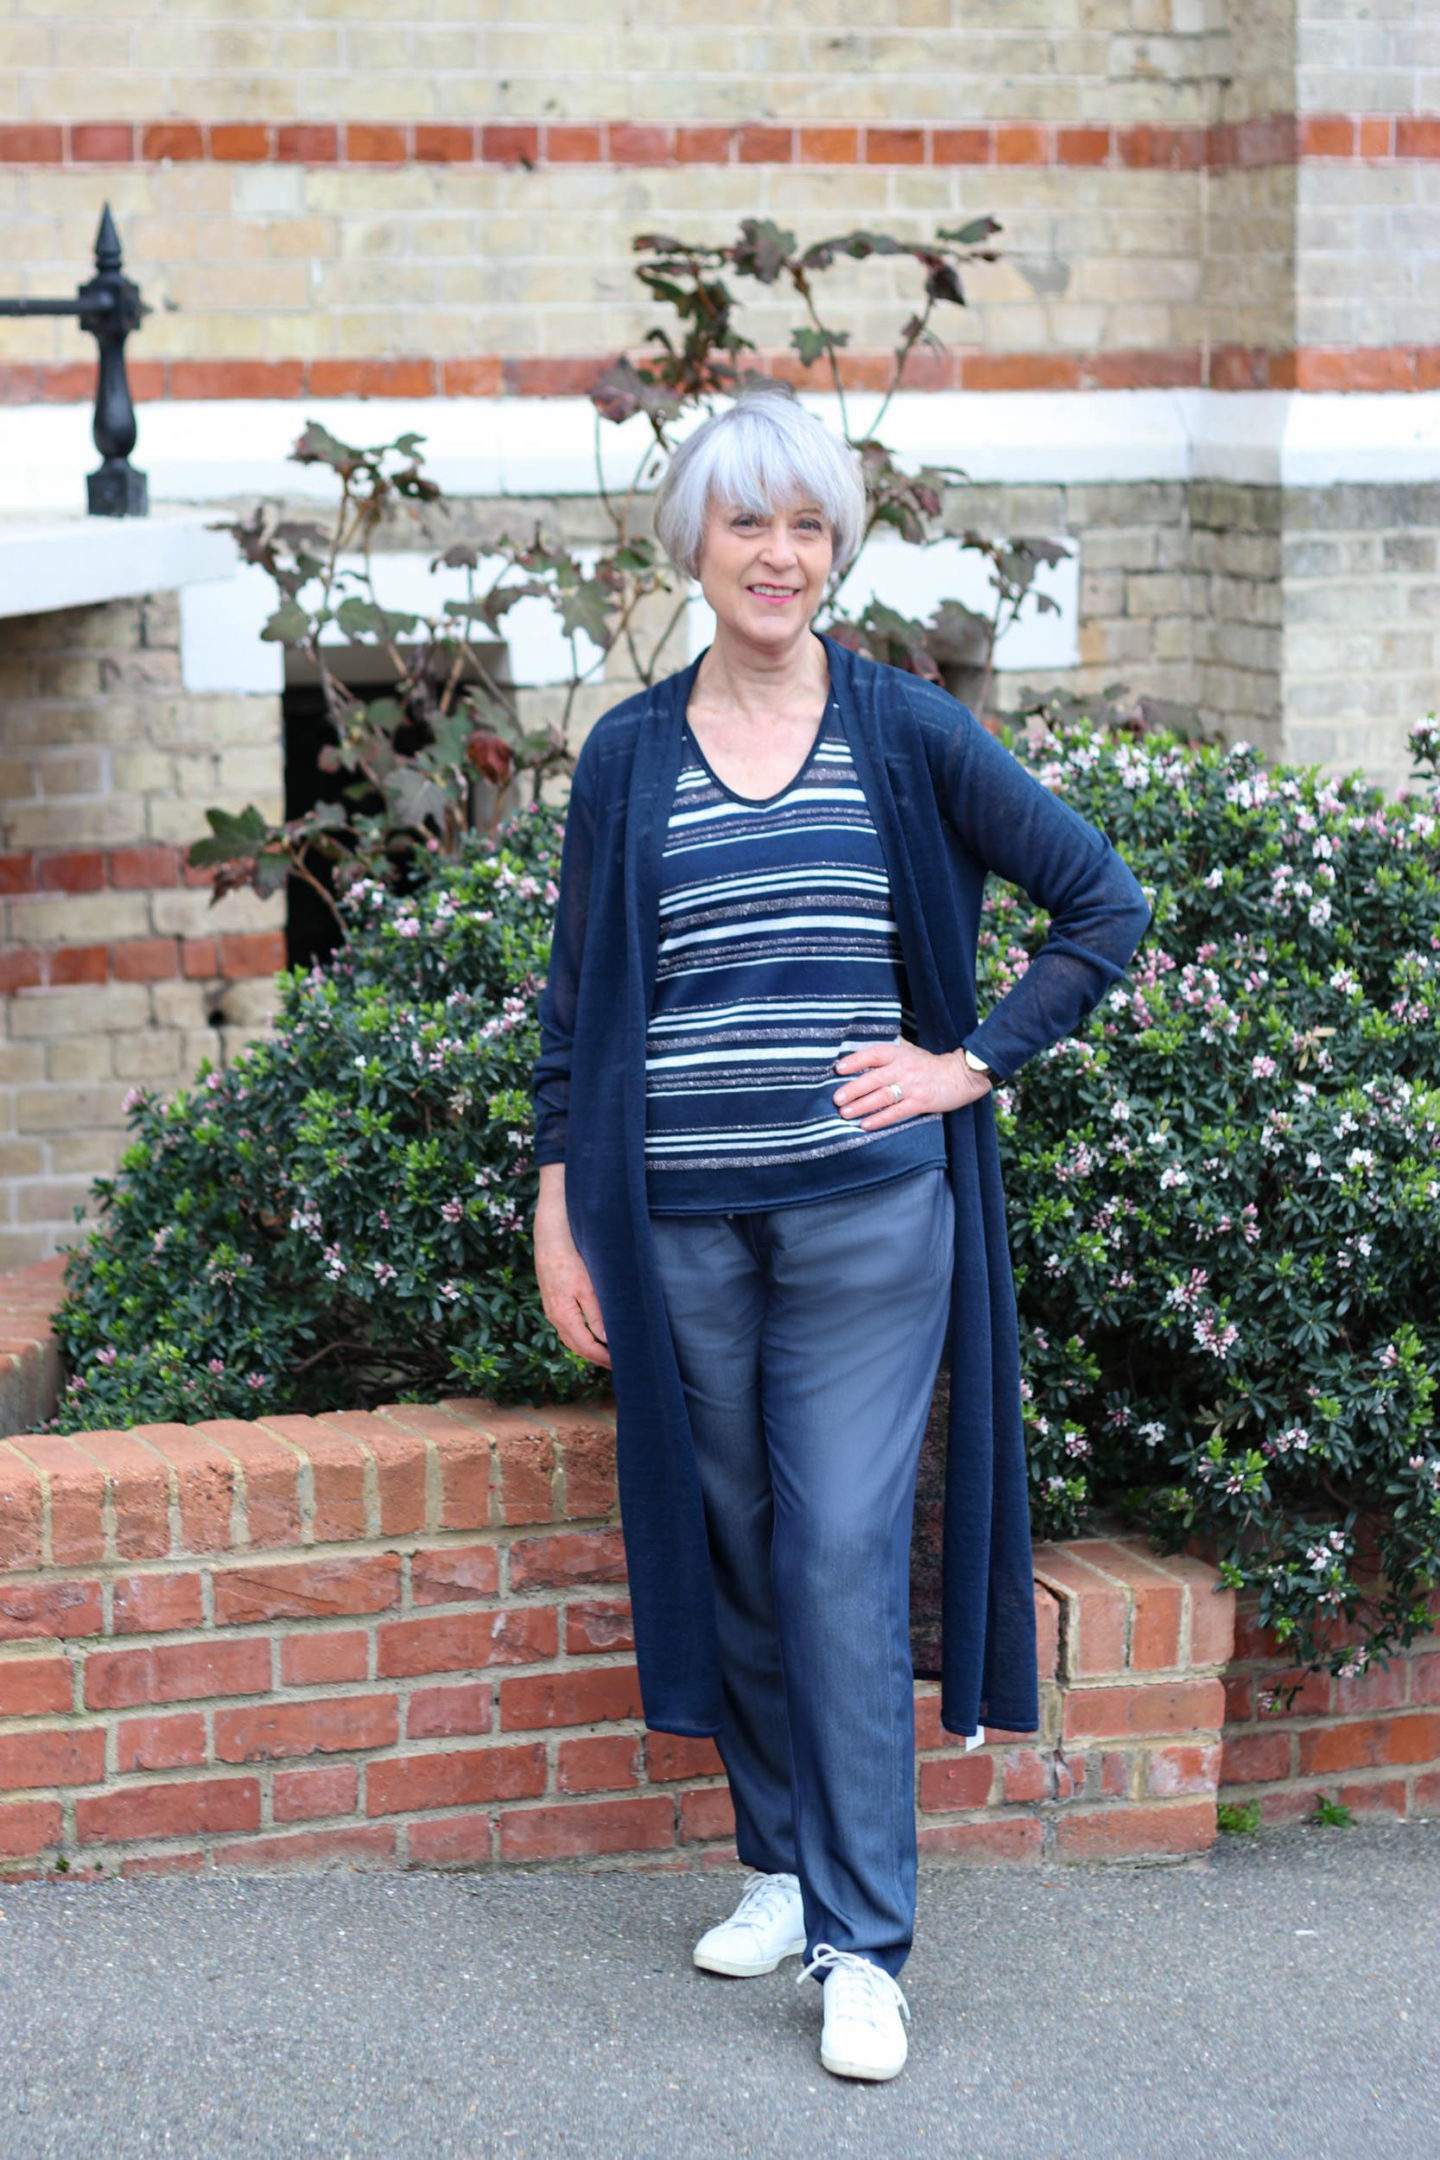 HopeFashion comfort denim trousers, lurex stripe top and linen cardigan